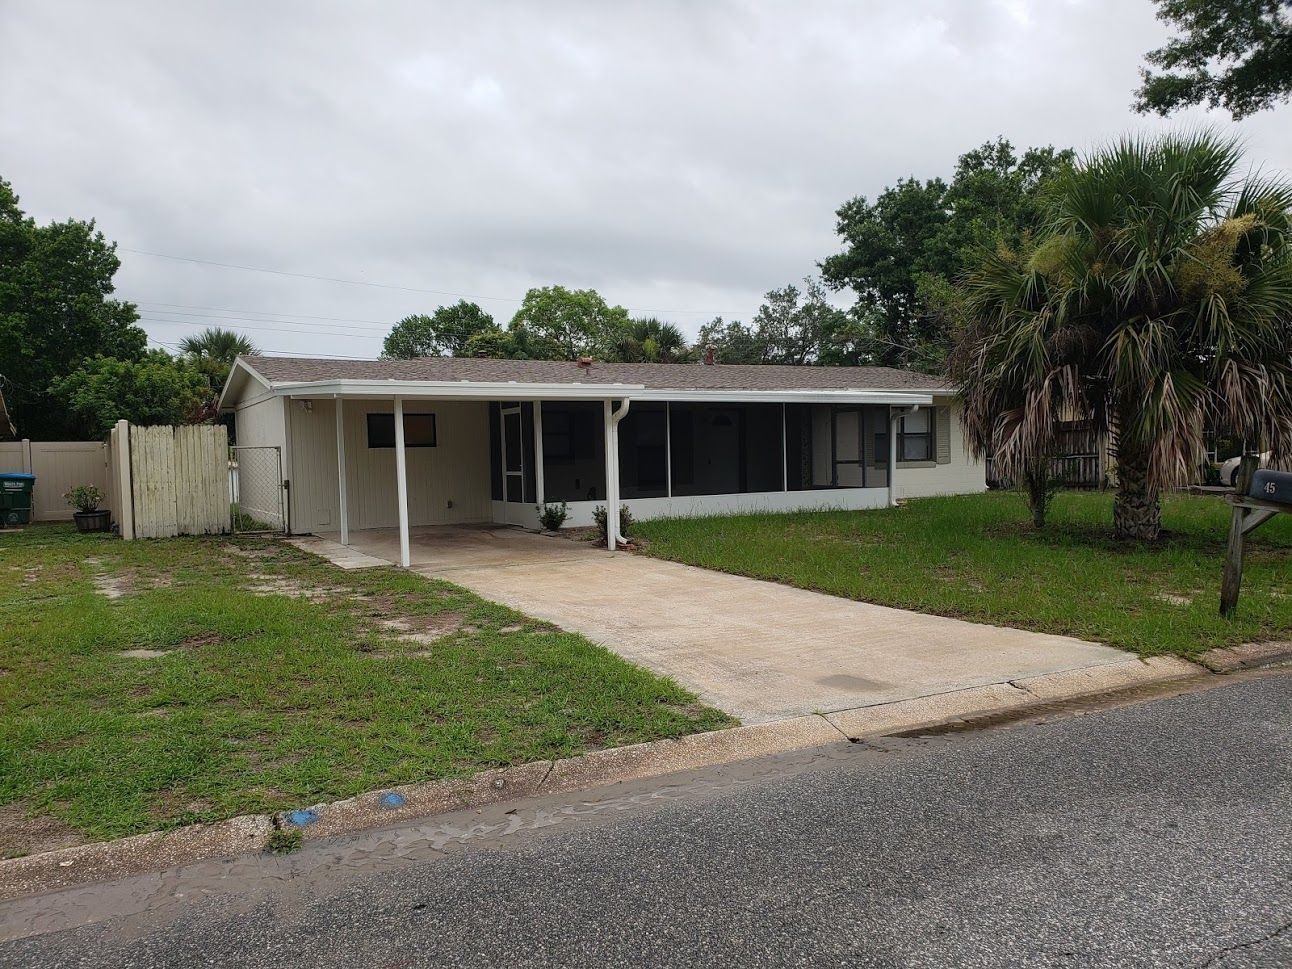 45 Cortez Ave S, Winter Springs, FL